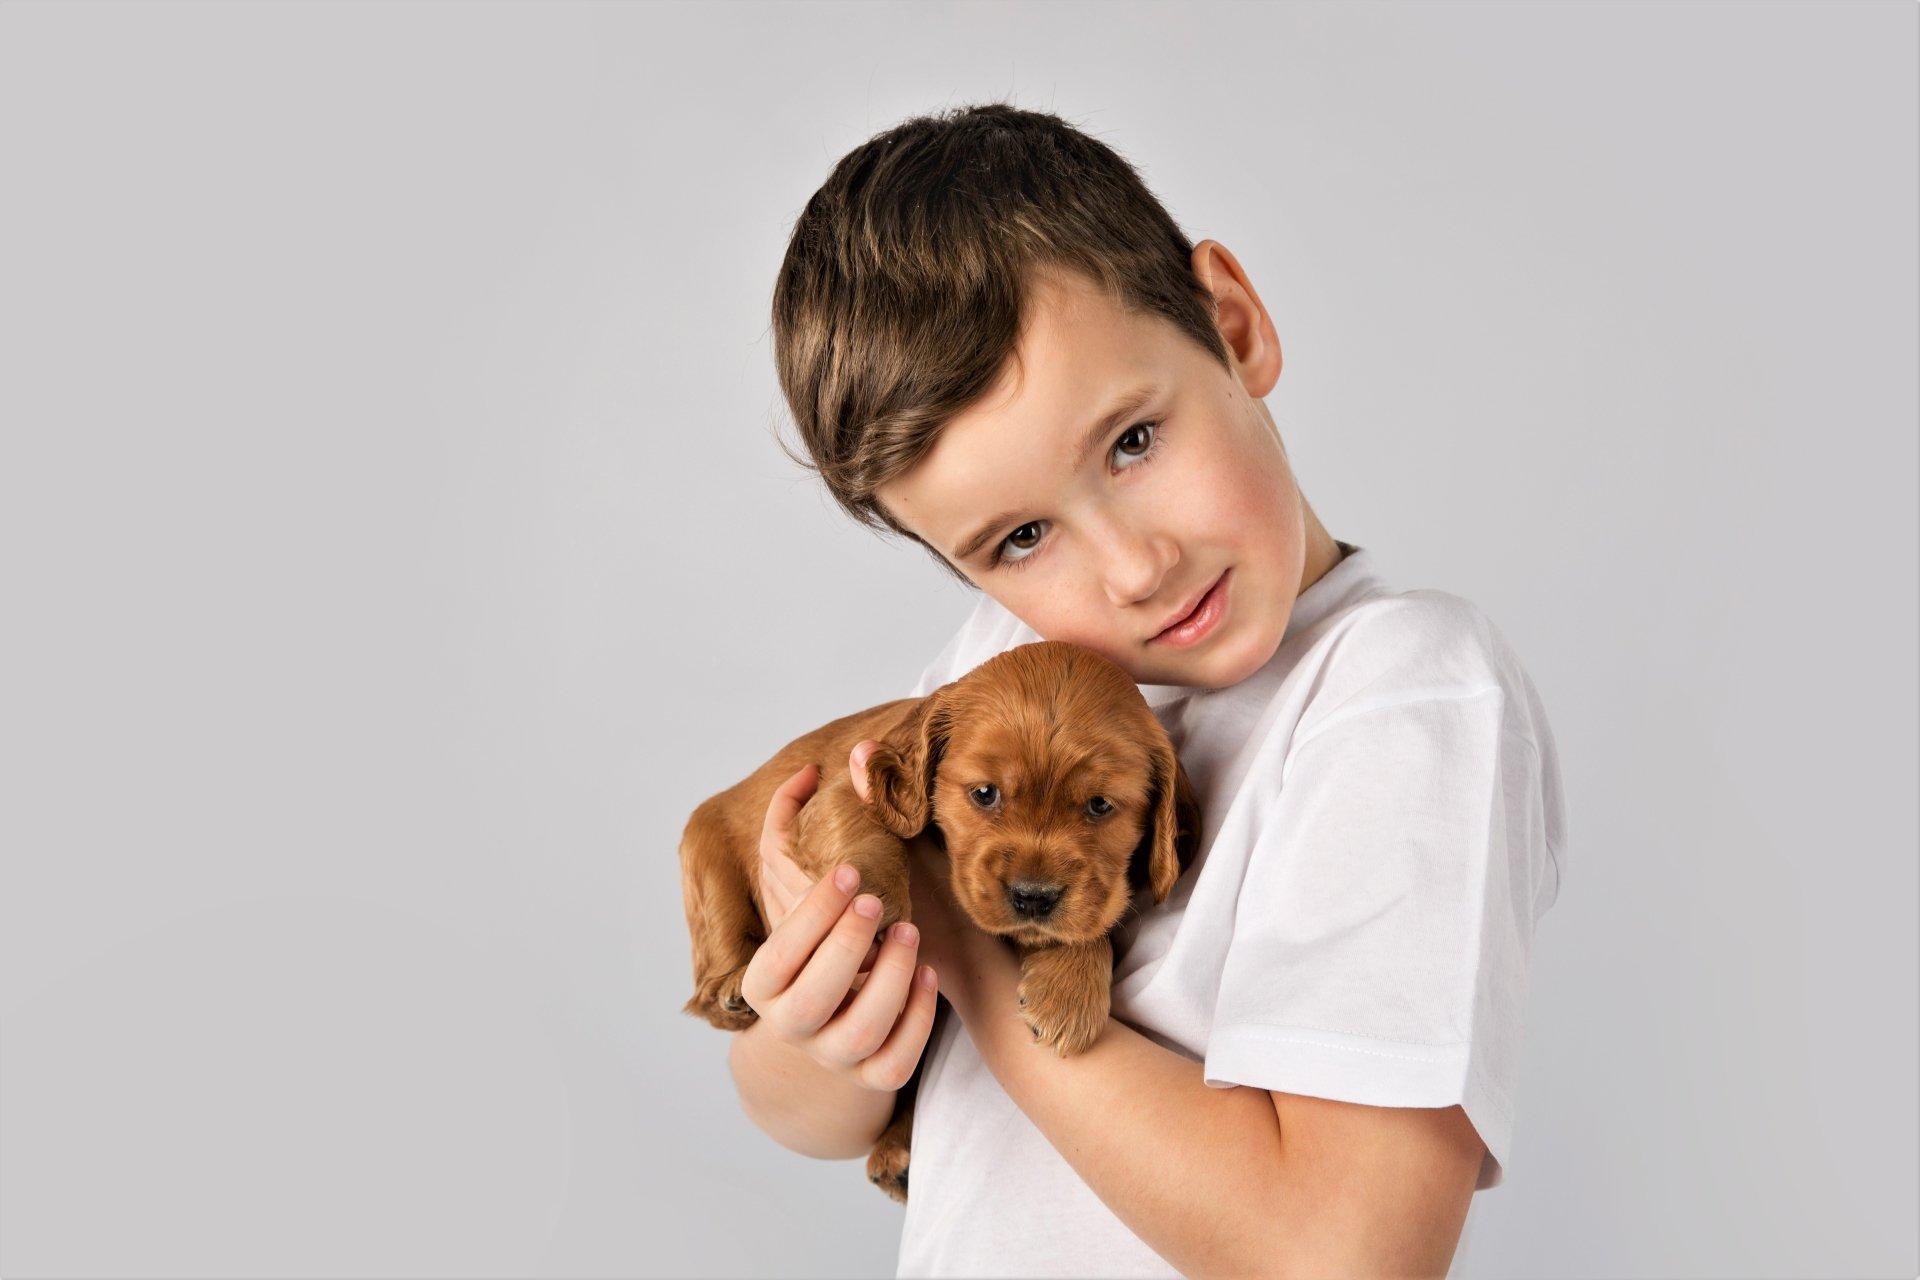 Photography - Child  Baby Animal Boy Little Boy Cute Puppy Wallpaper